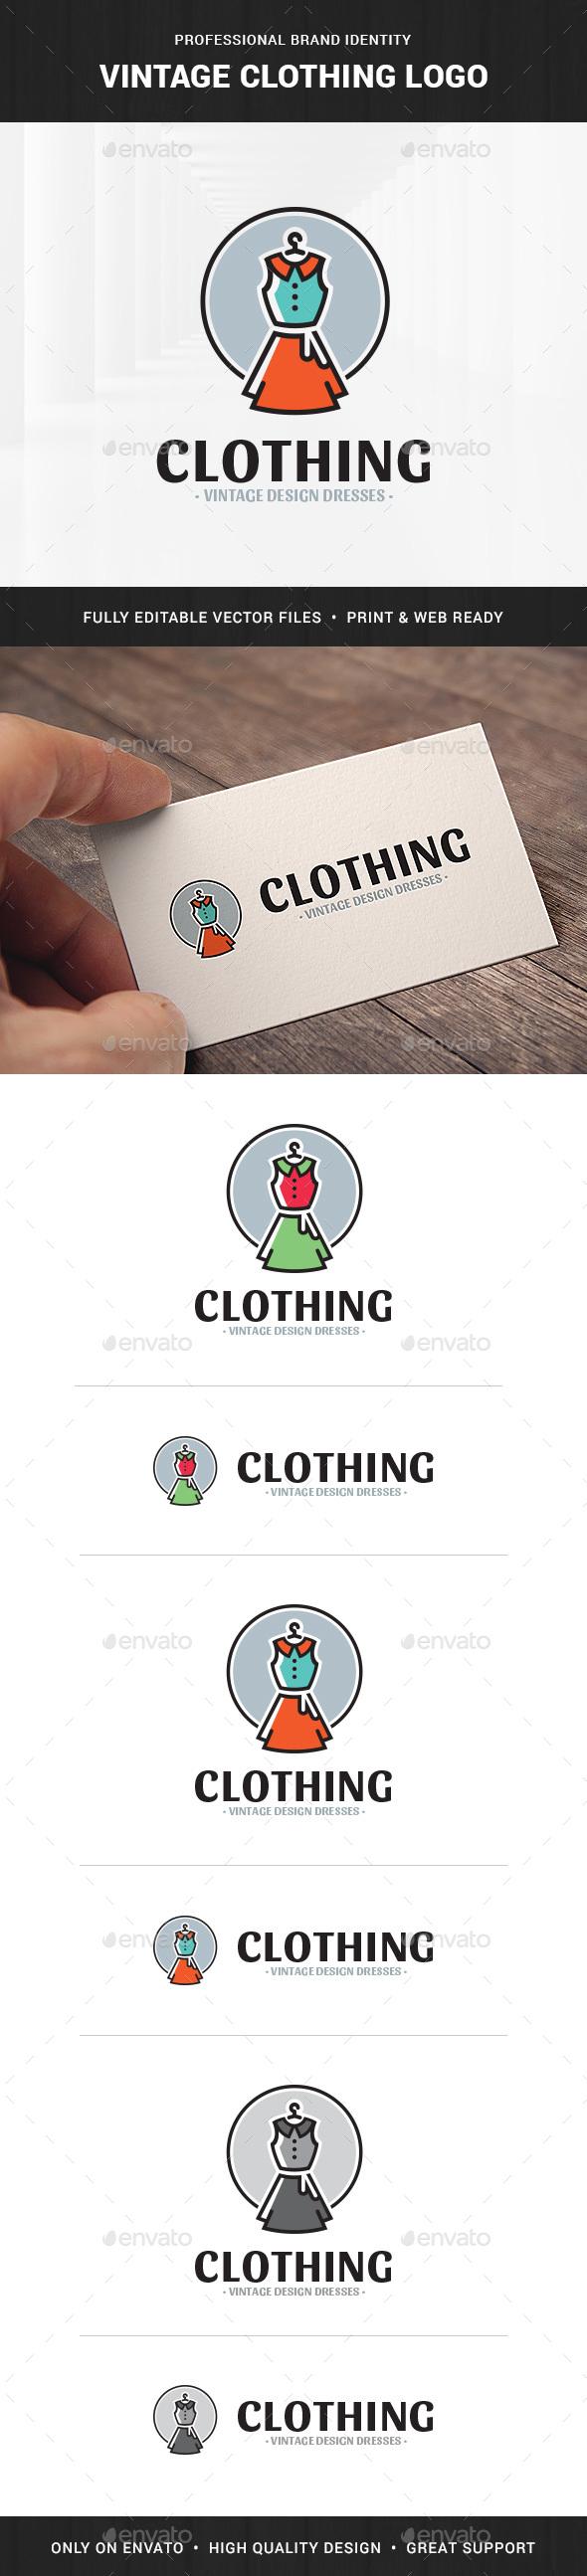 Vintage Clothing Logo Template